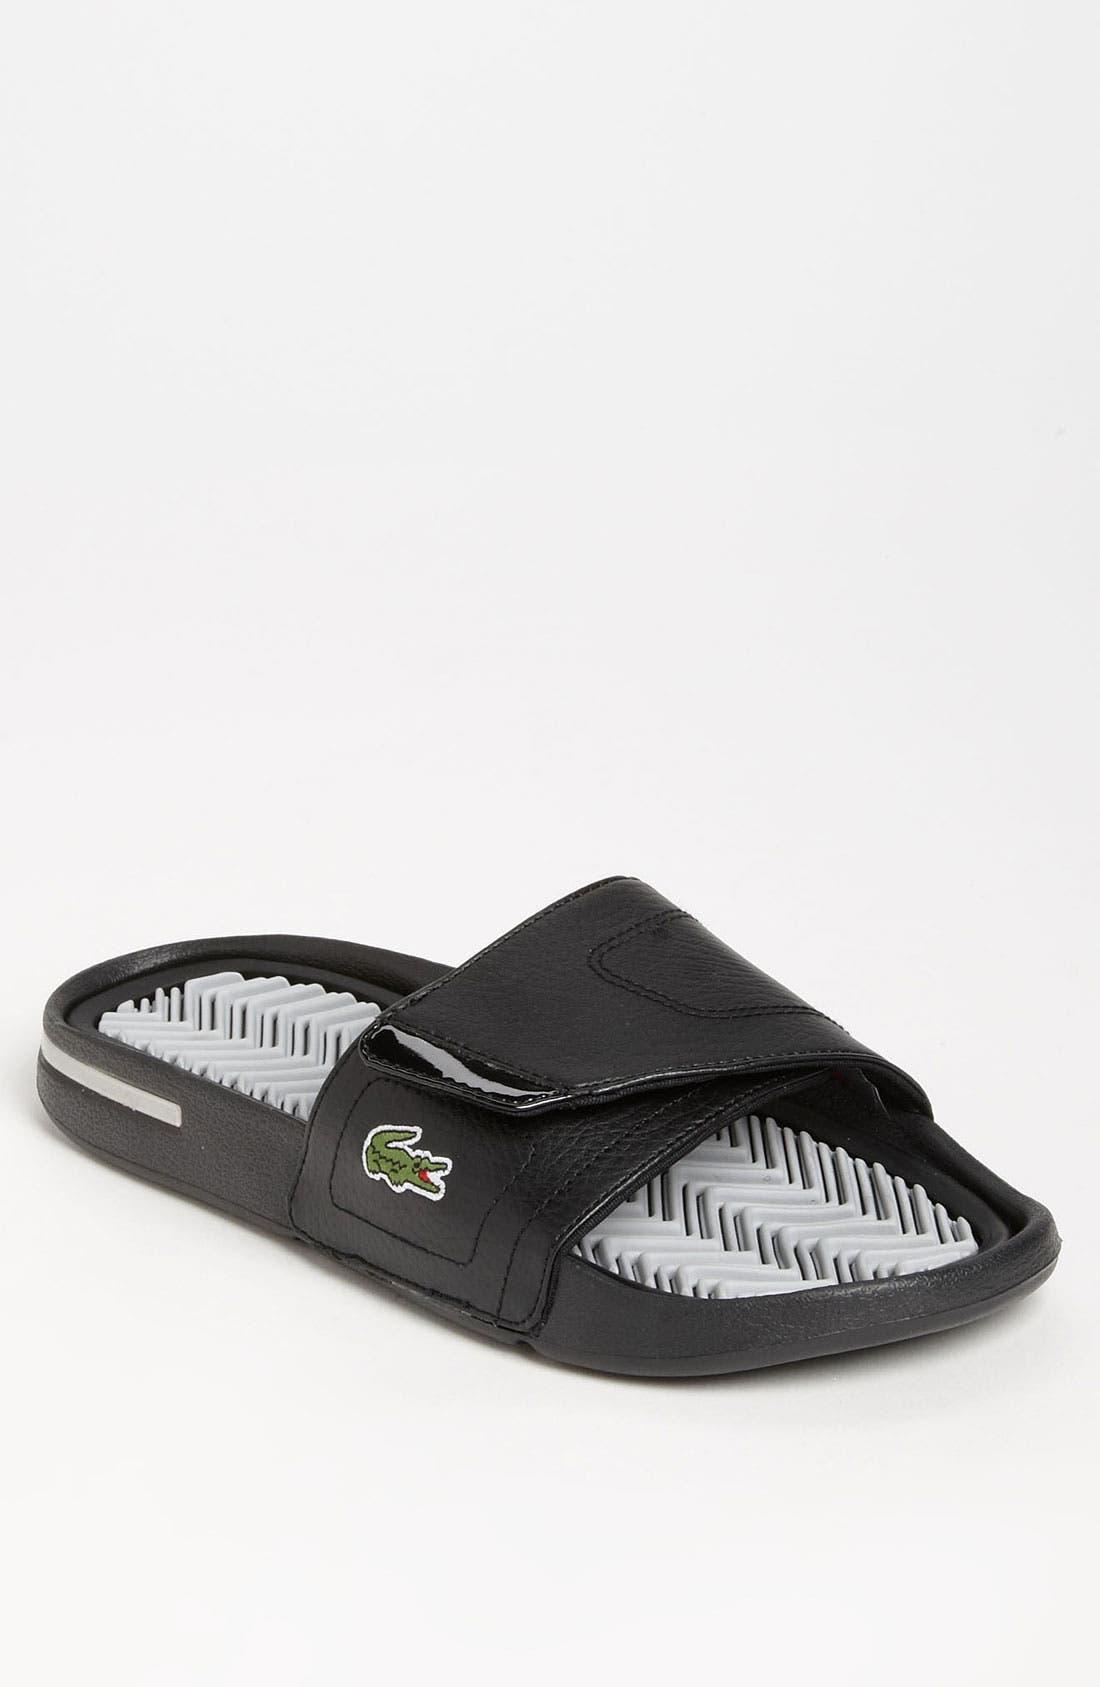 Main Image - Lacoste 'Molitor' Flip Flop